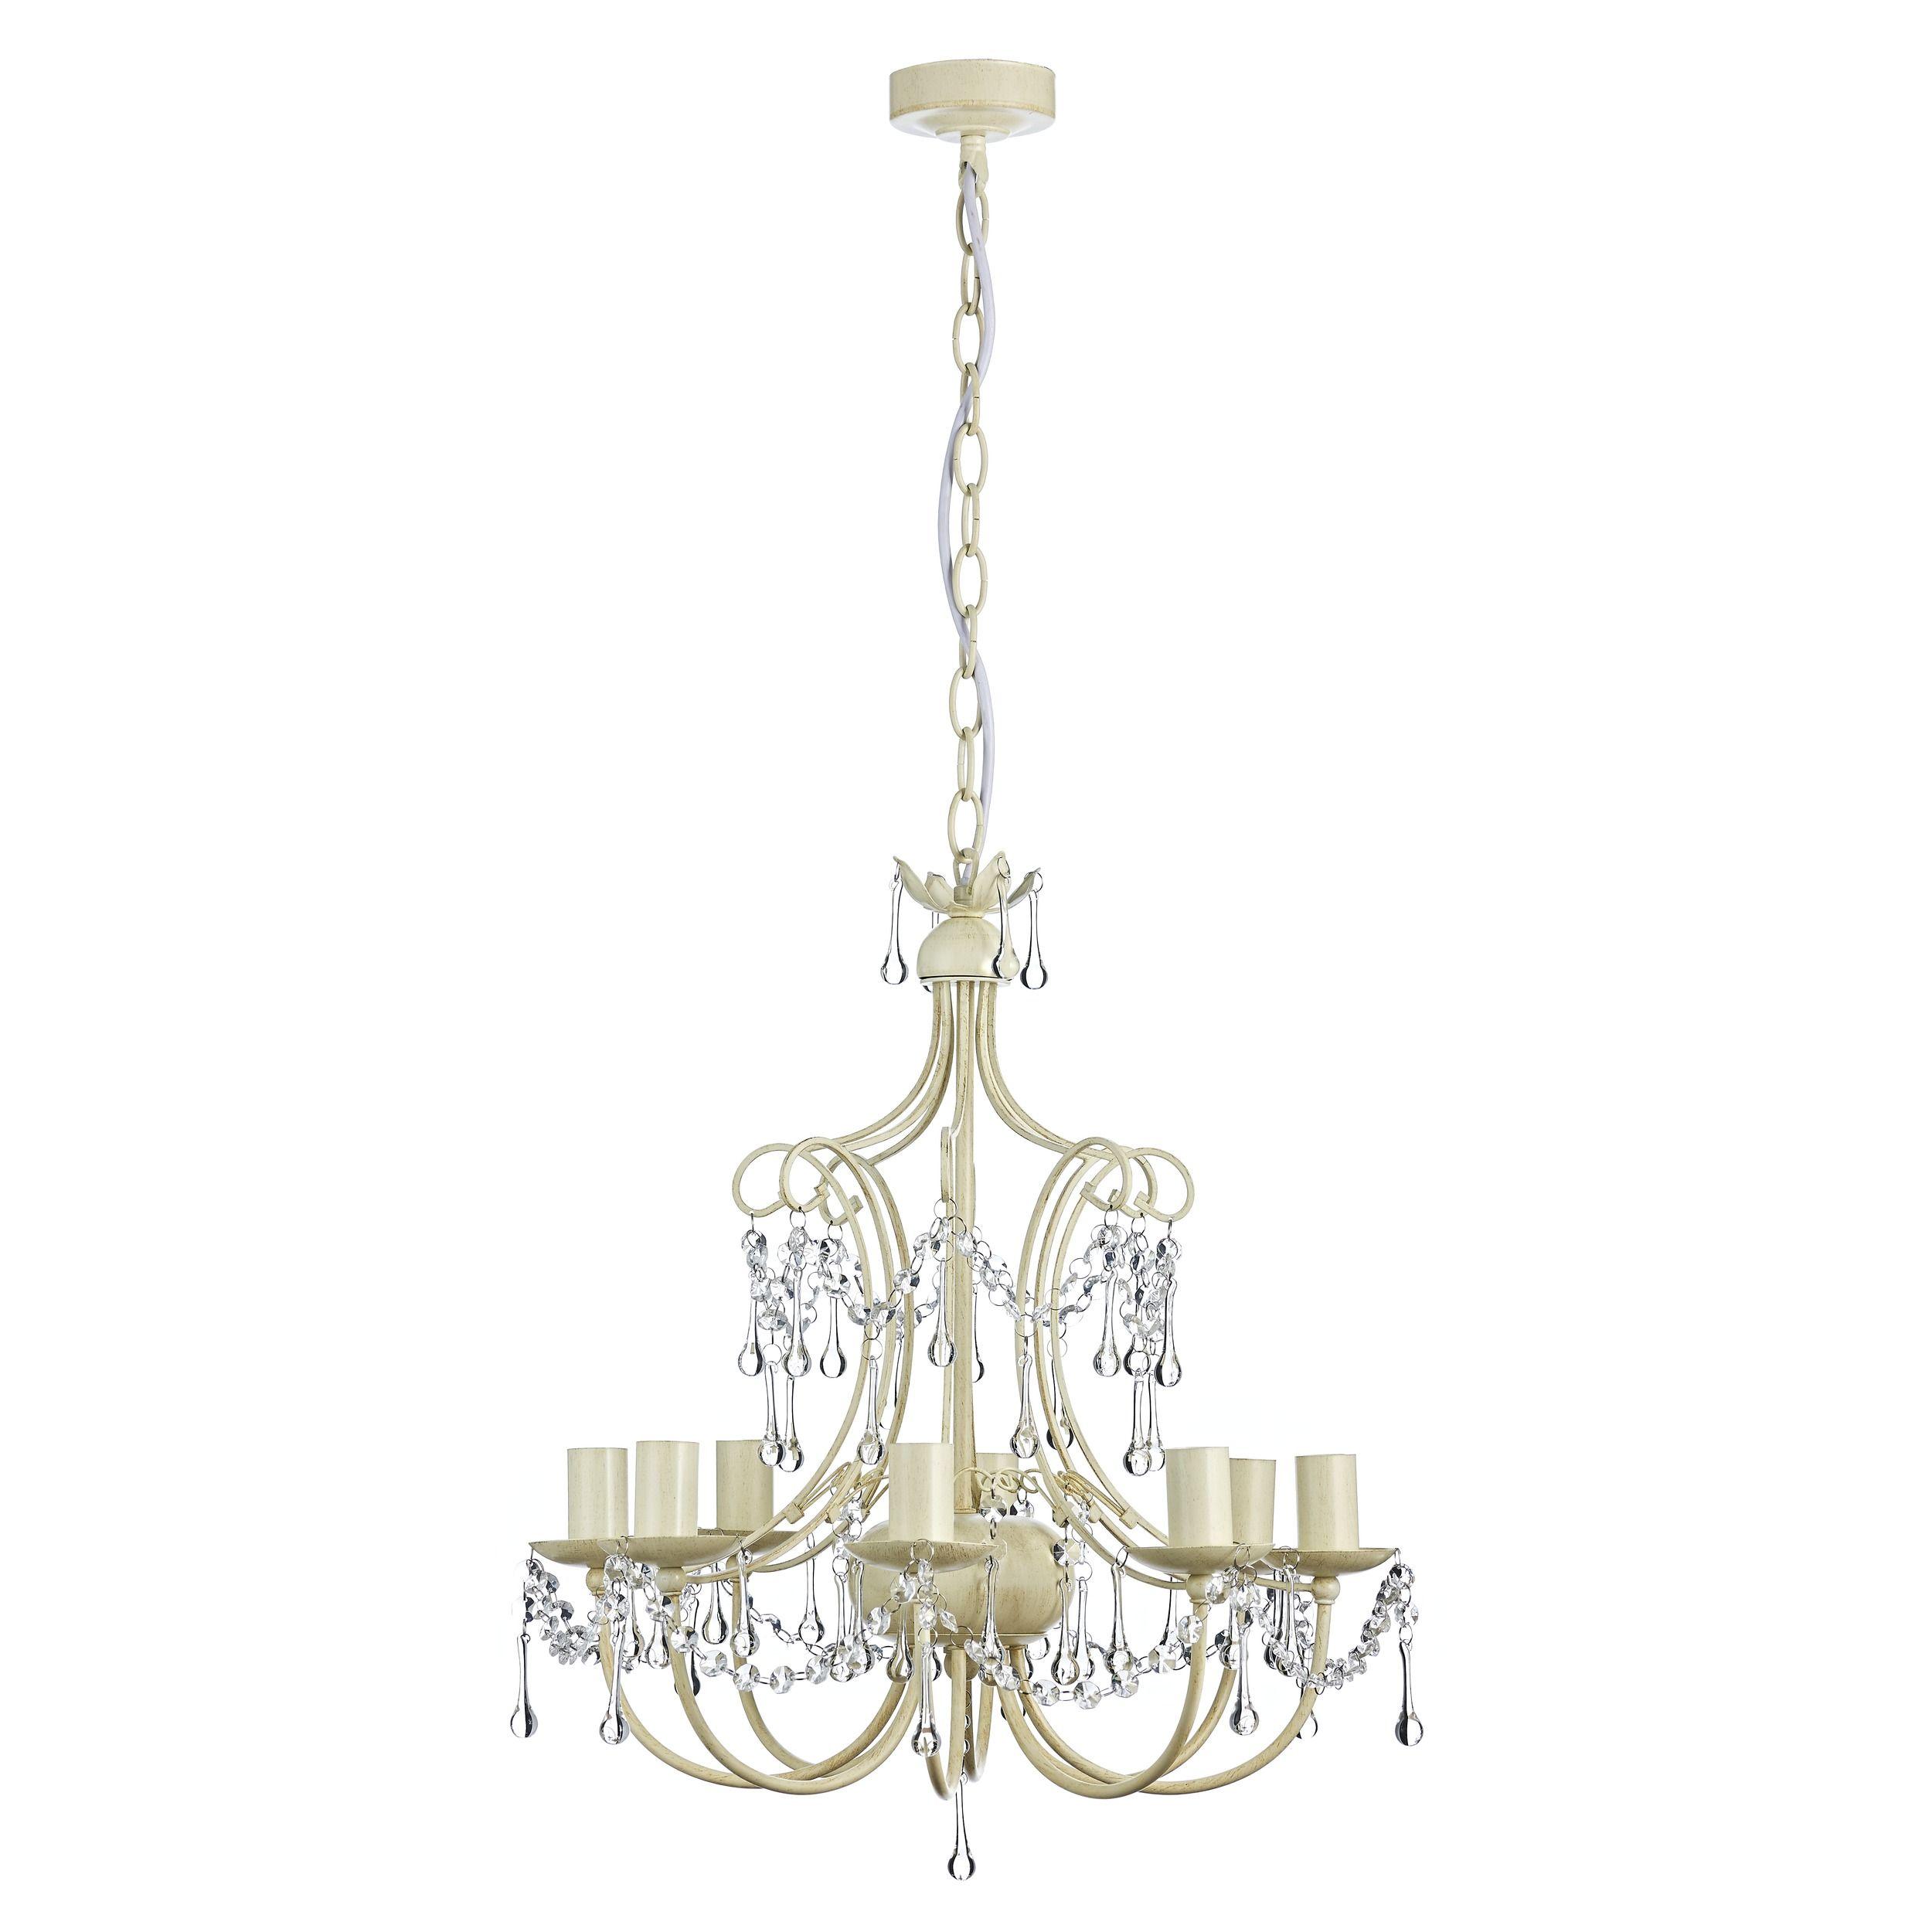 Chella Cream 5 Light Chandelier | 5 light chandelier